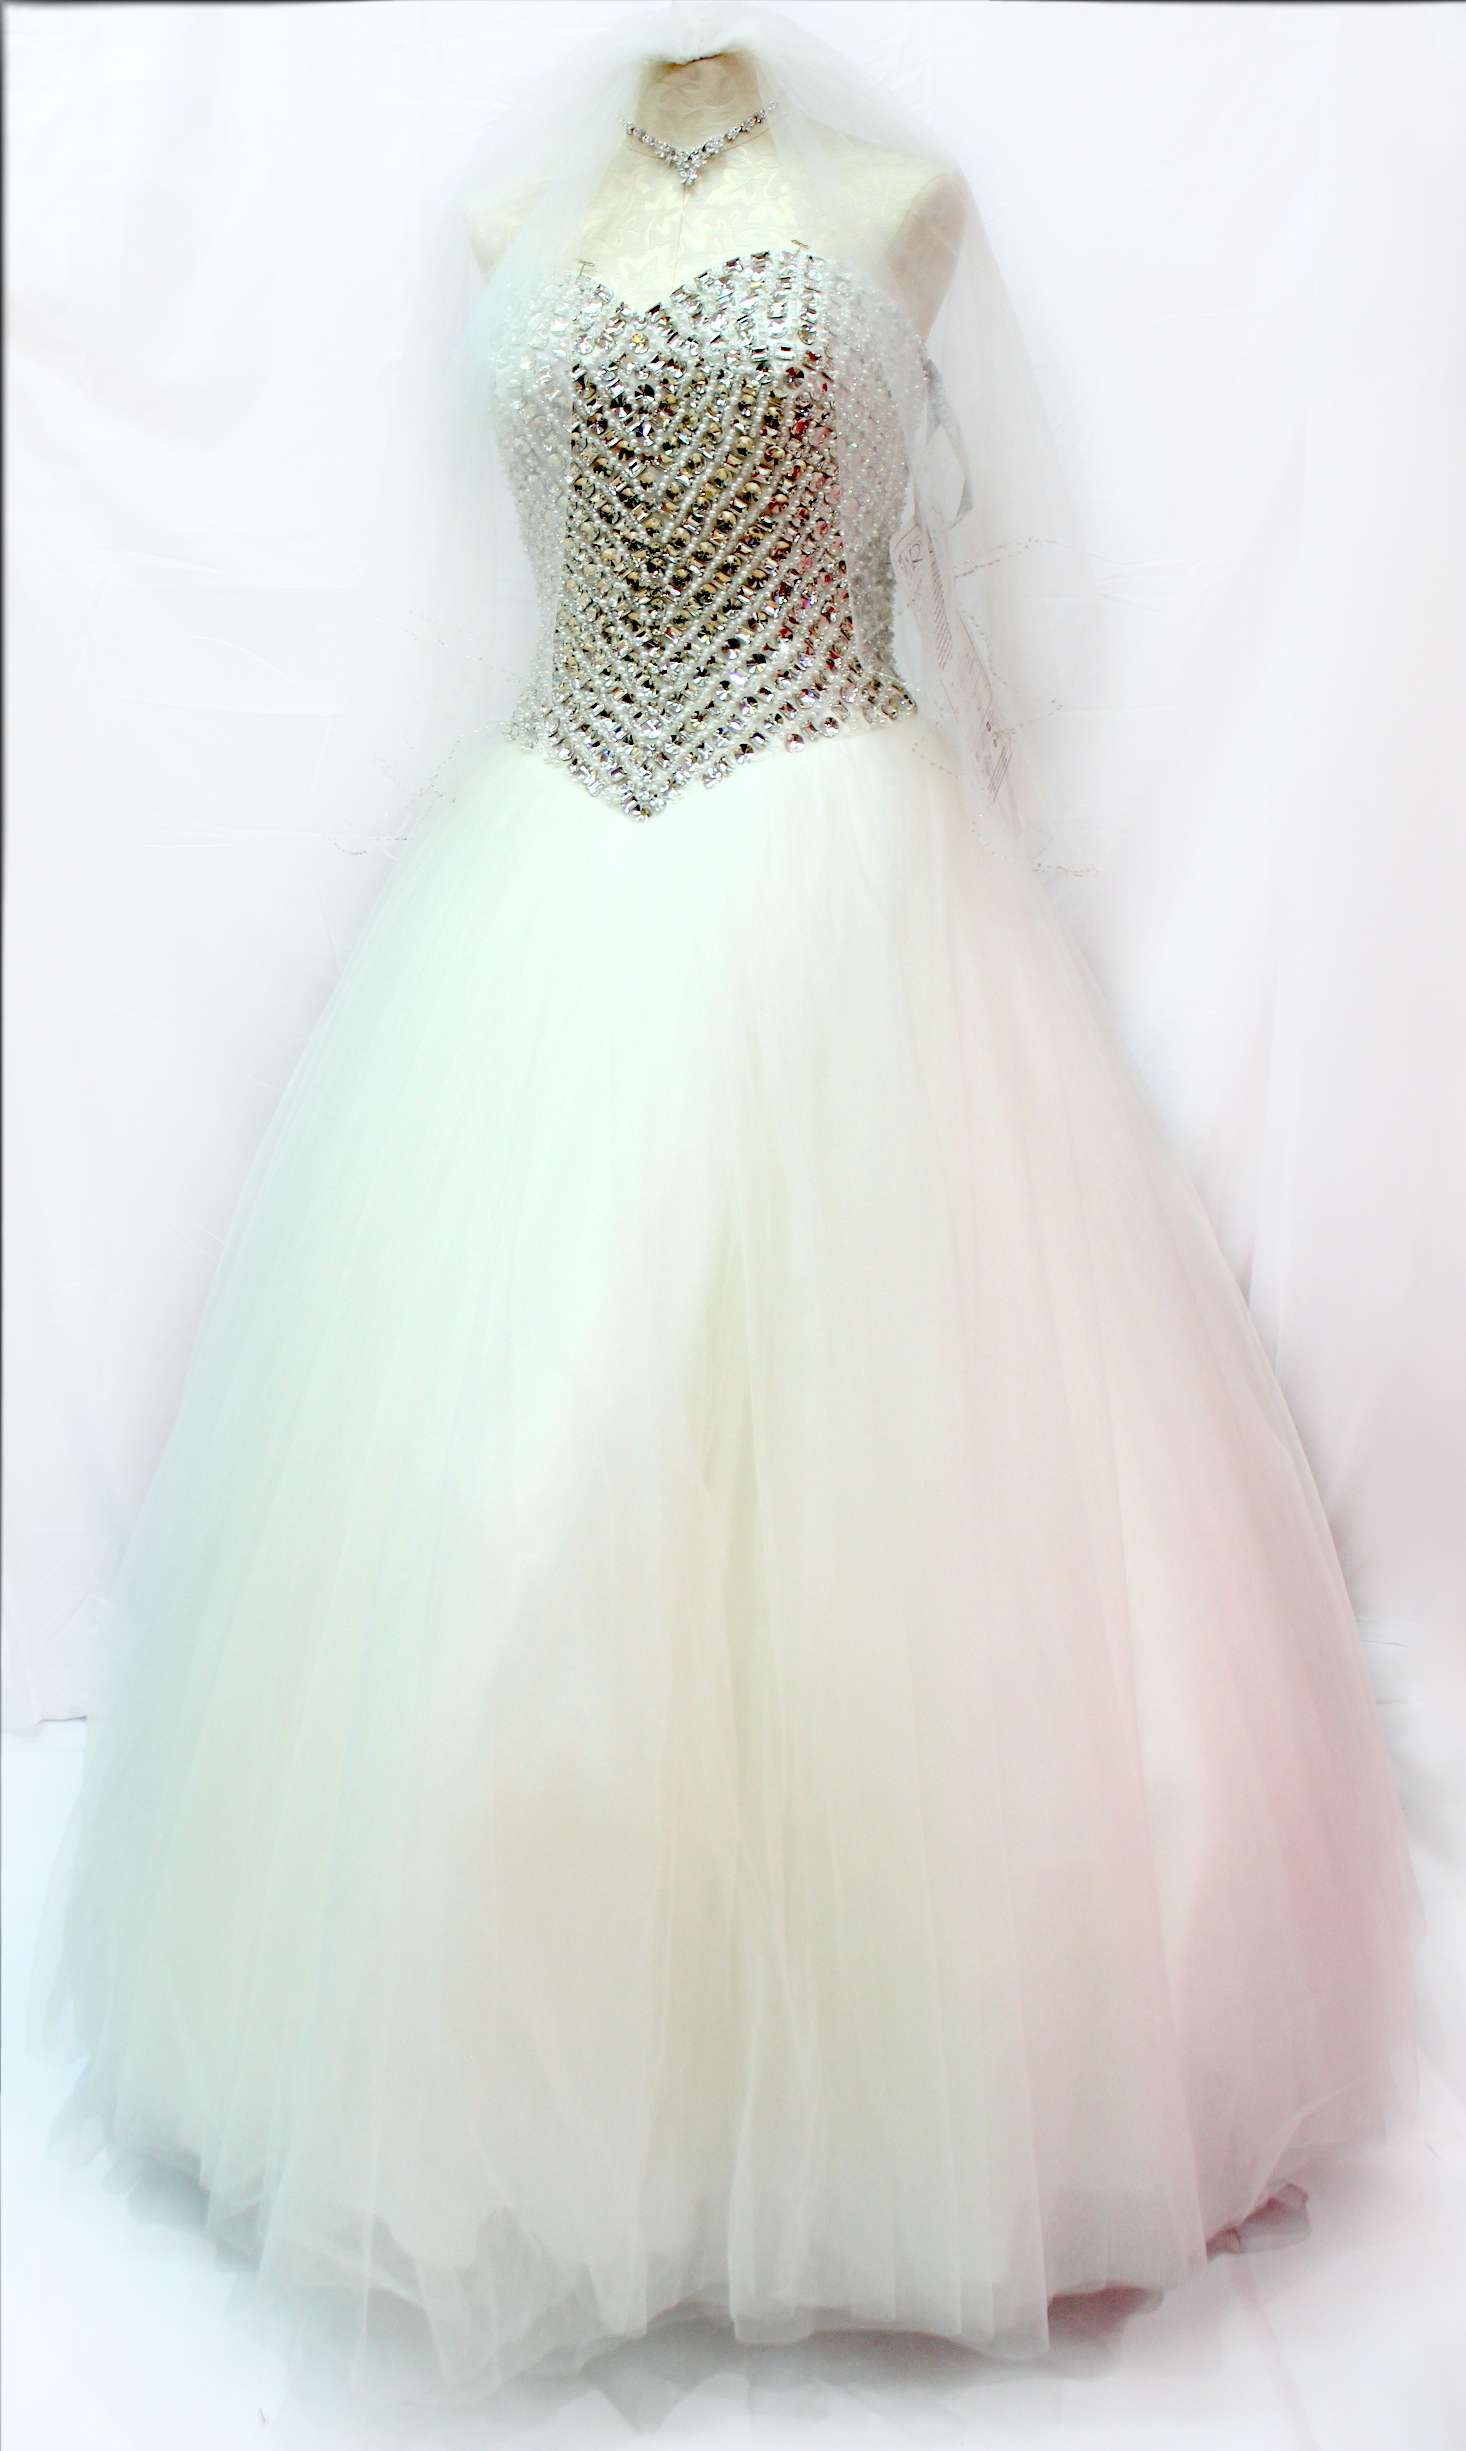 Bridal Dress with Rhinestones